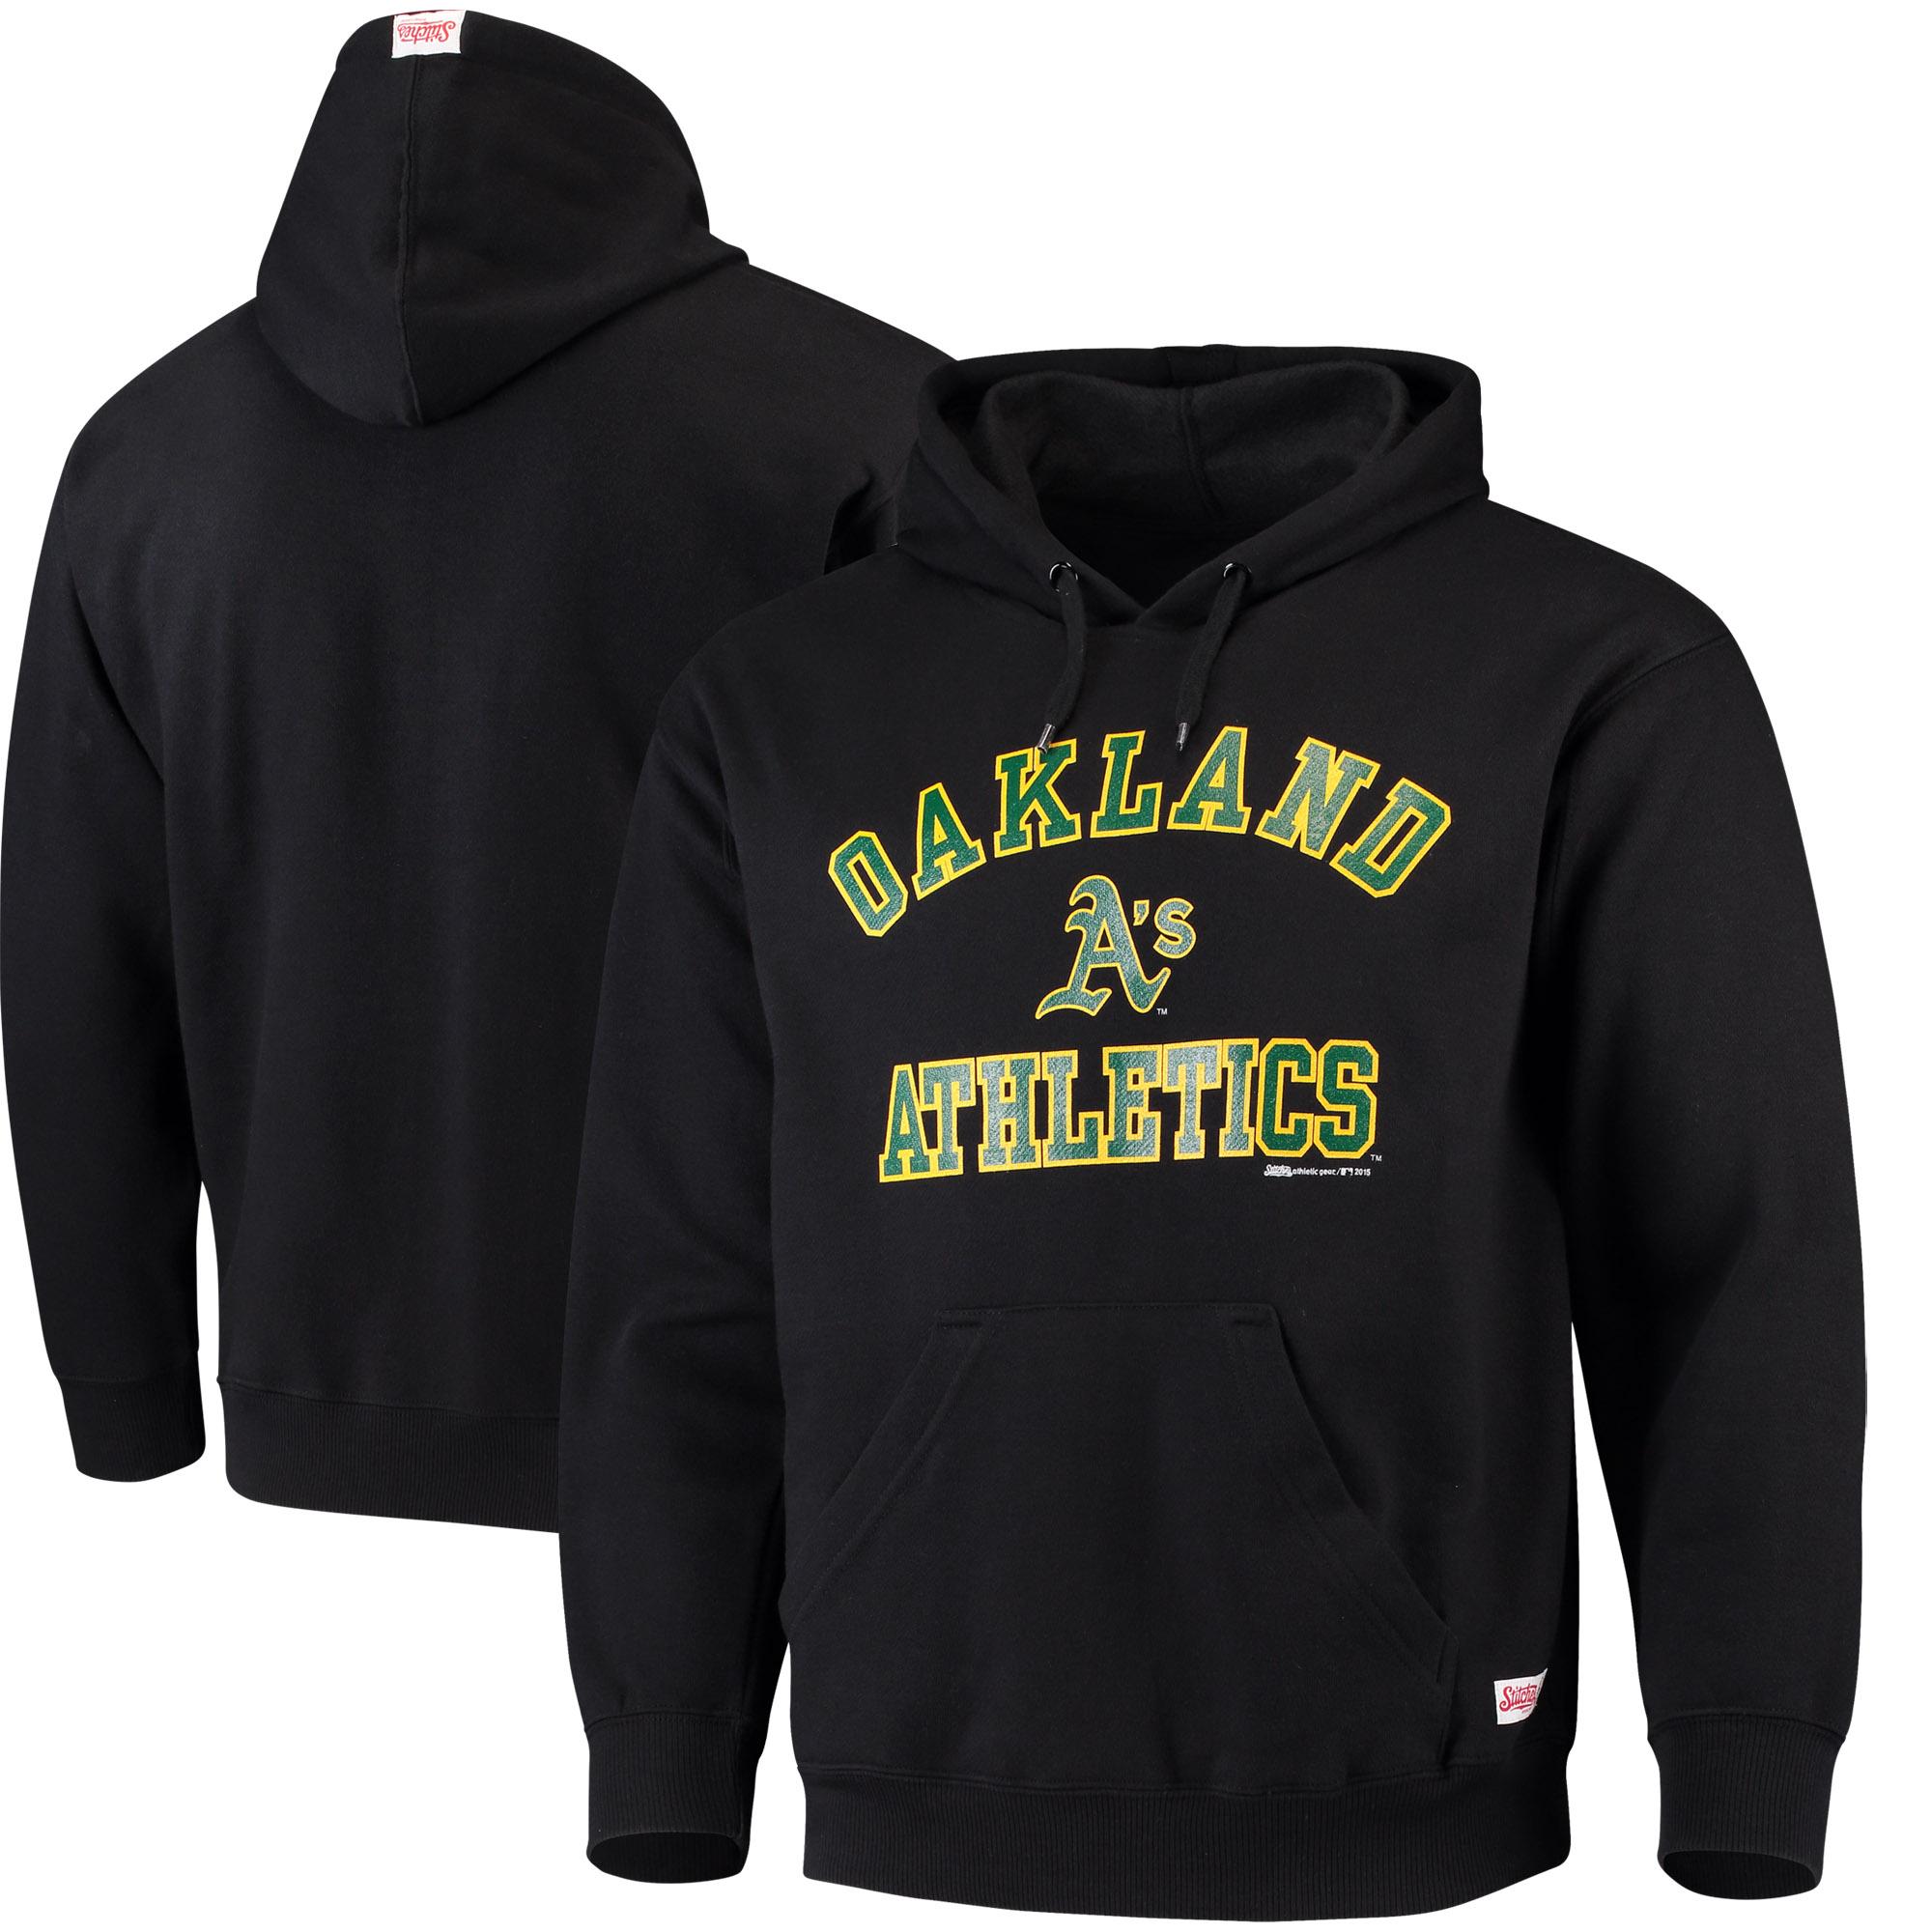 Oakland Athletics Stitches Fastball Fleece Pullover Hoodie - Black